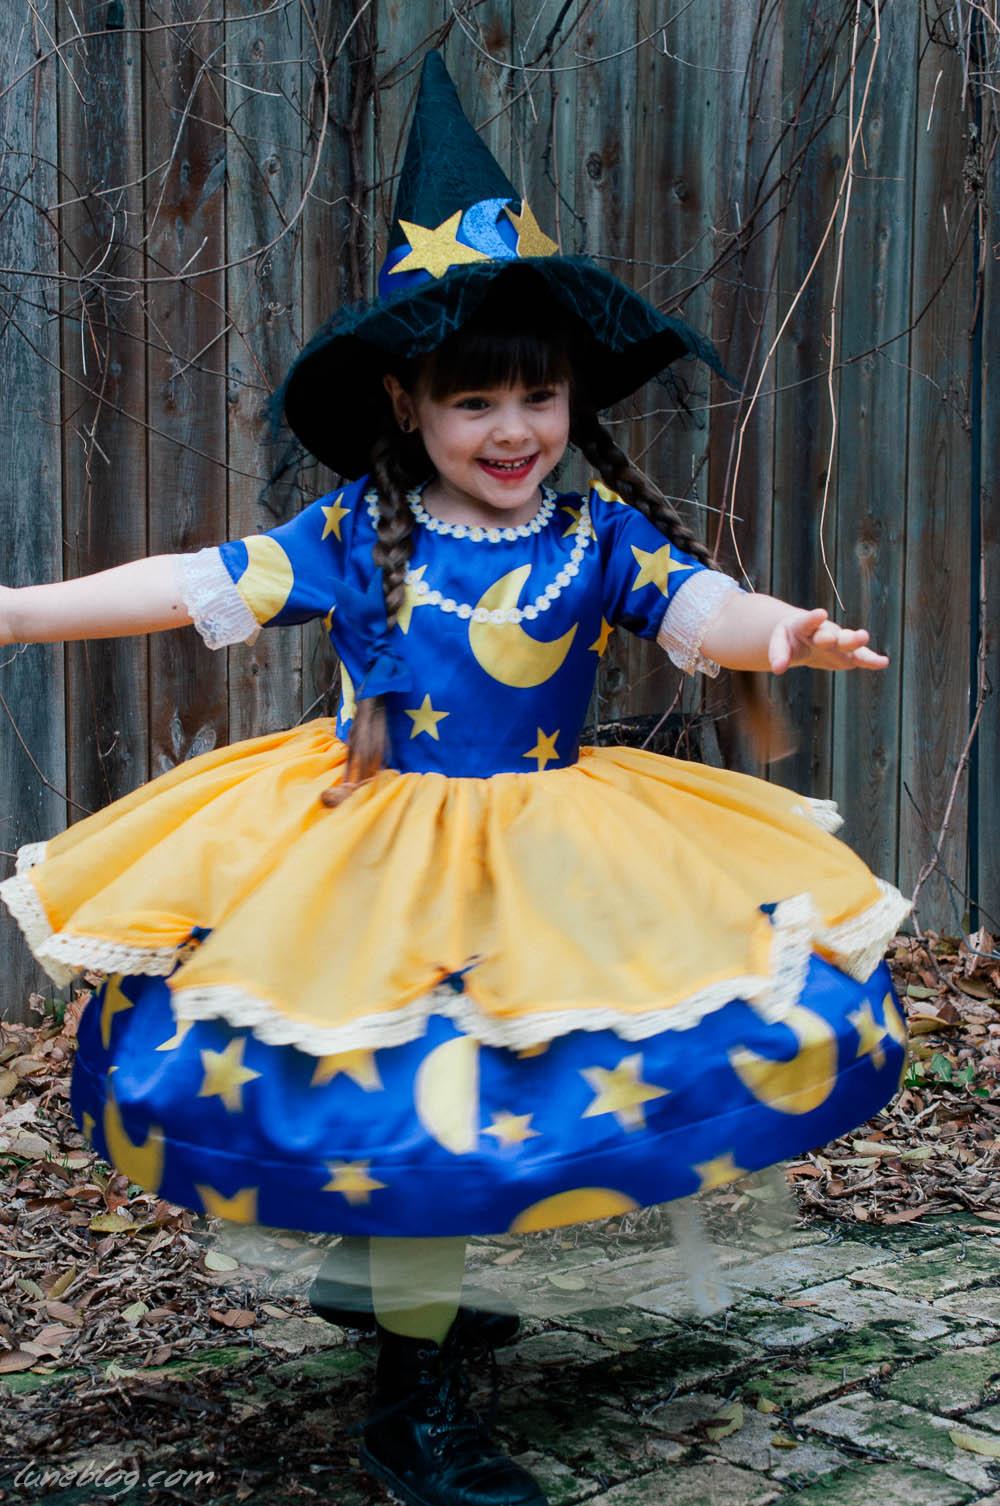 halloween costumes 2015 lune travels blog (16 of 39).jpg